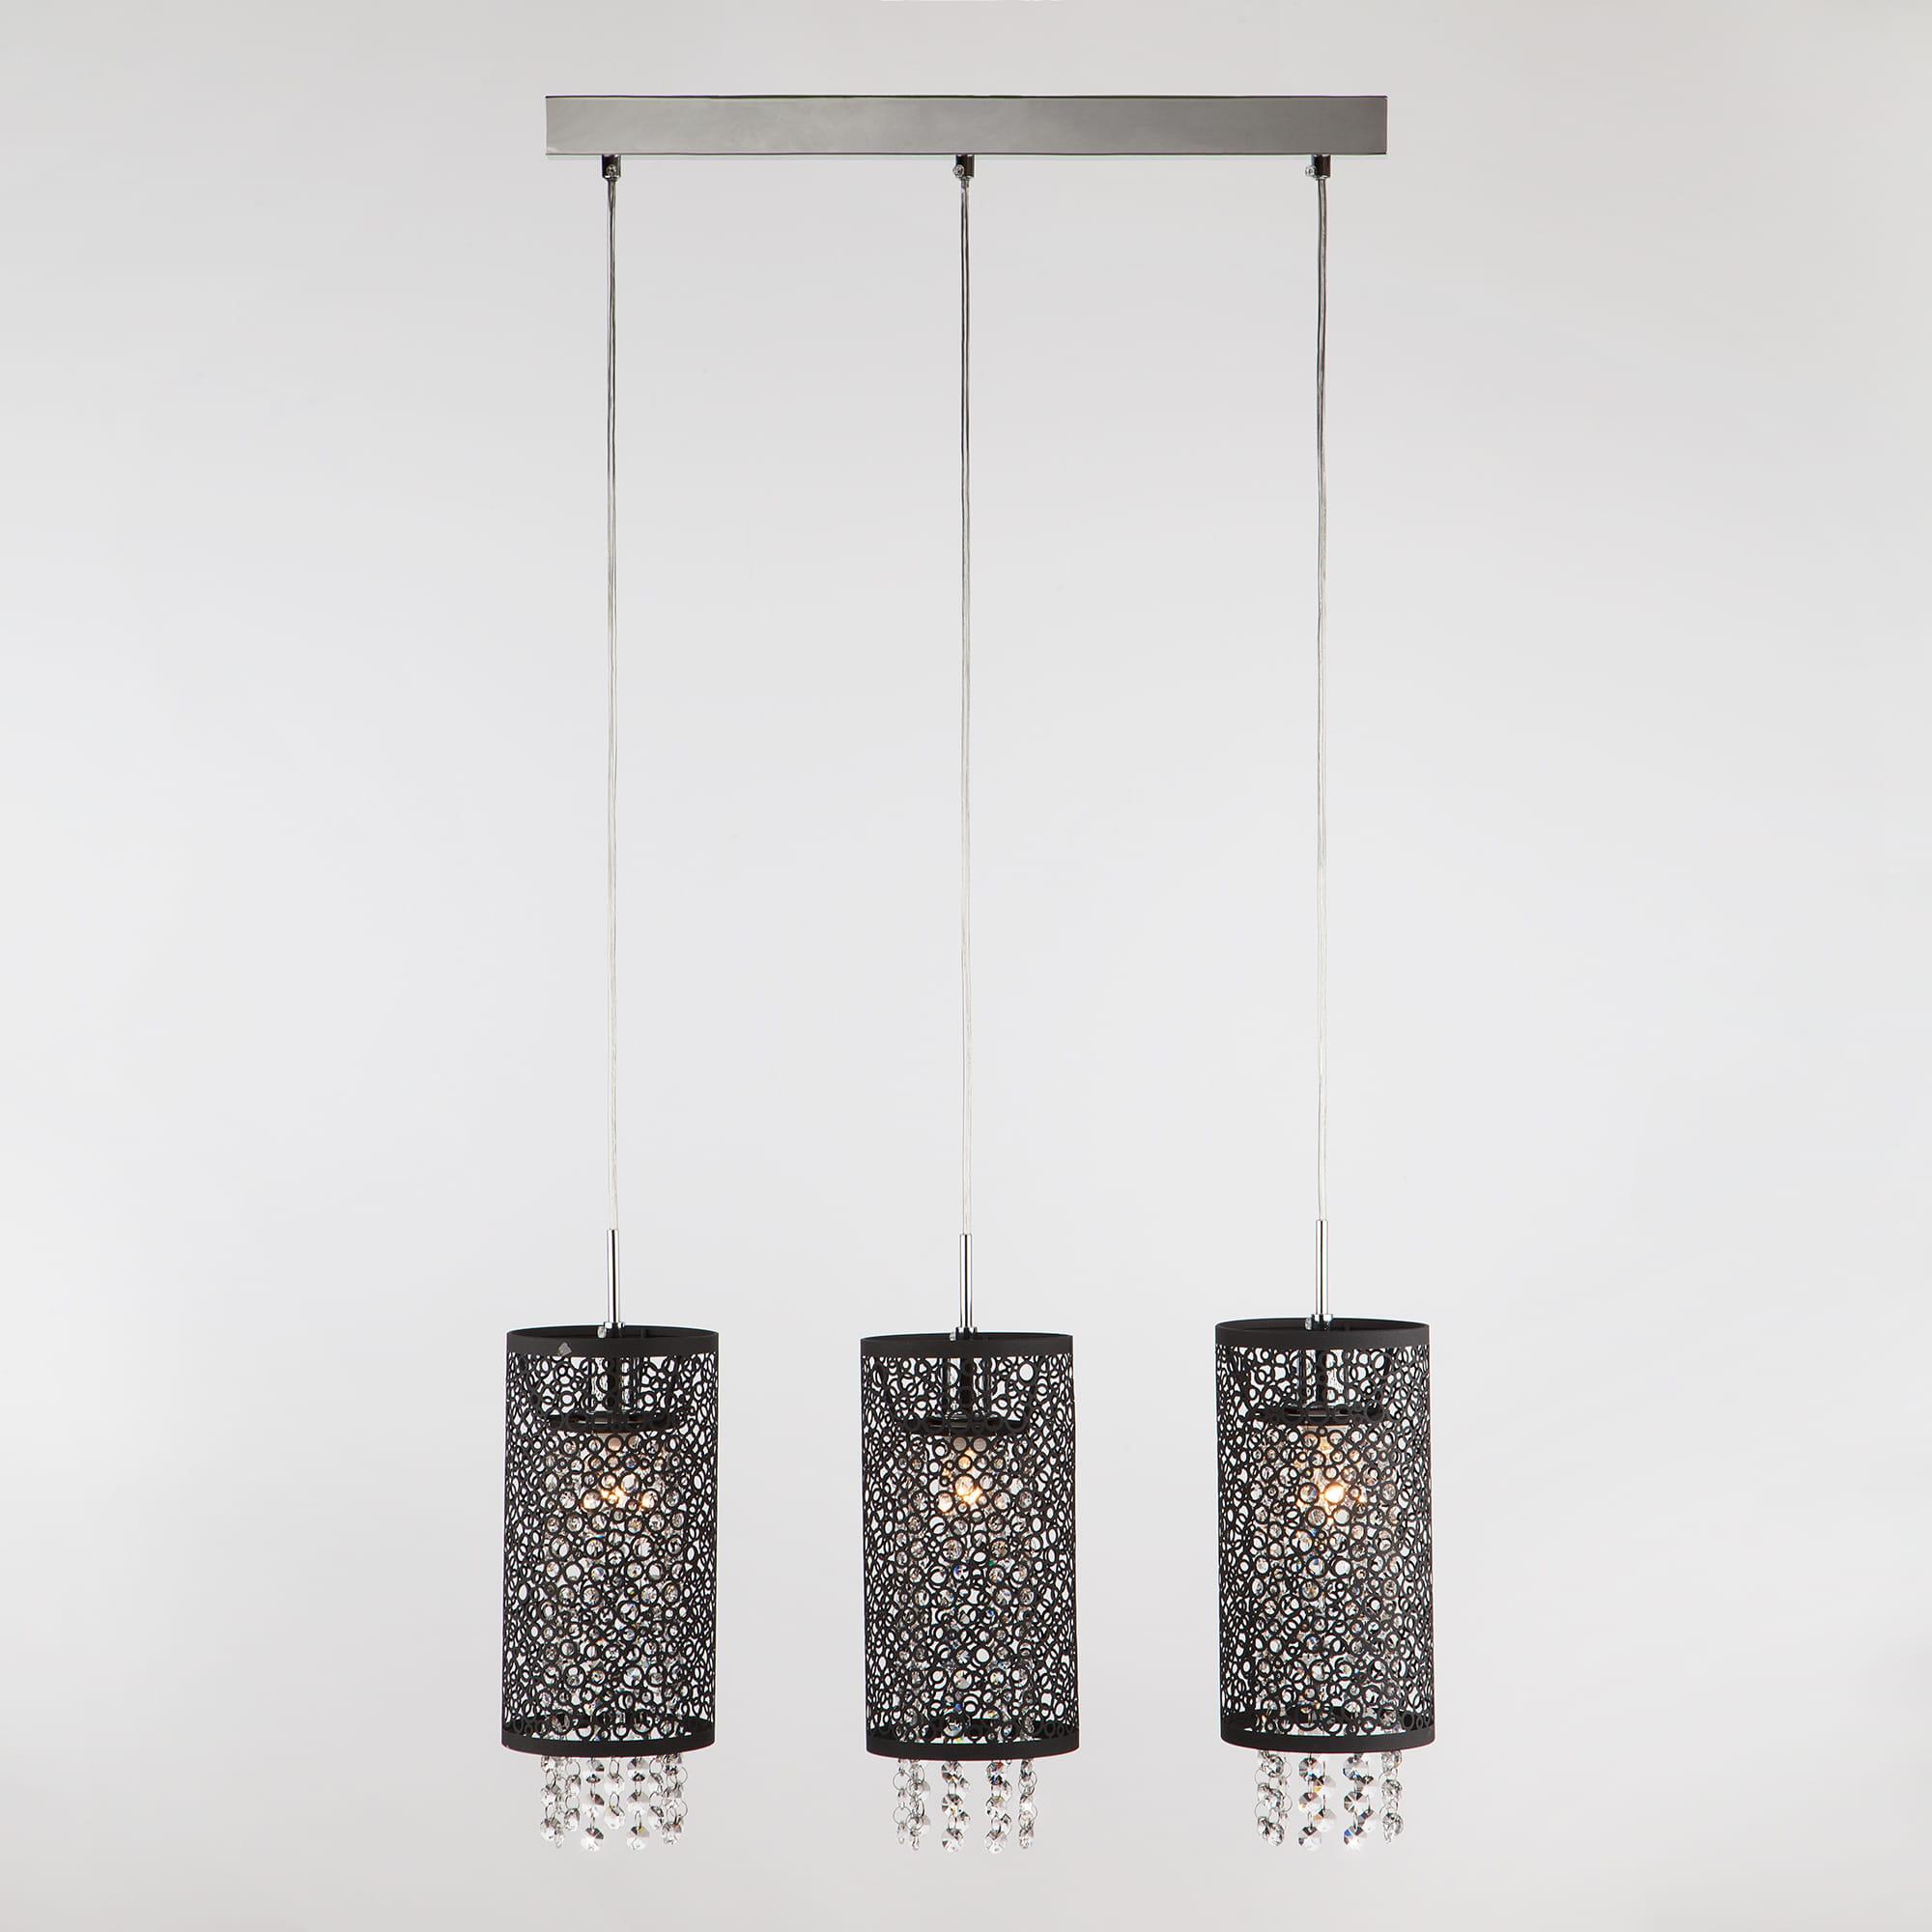 Lampa Sufitowa Manhattan Czarna Krysztalki 3x60w Eurostar